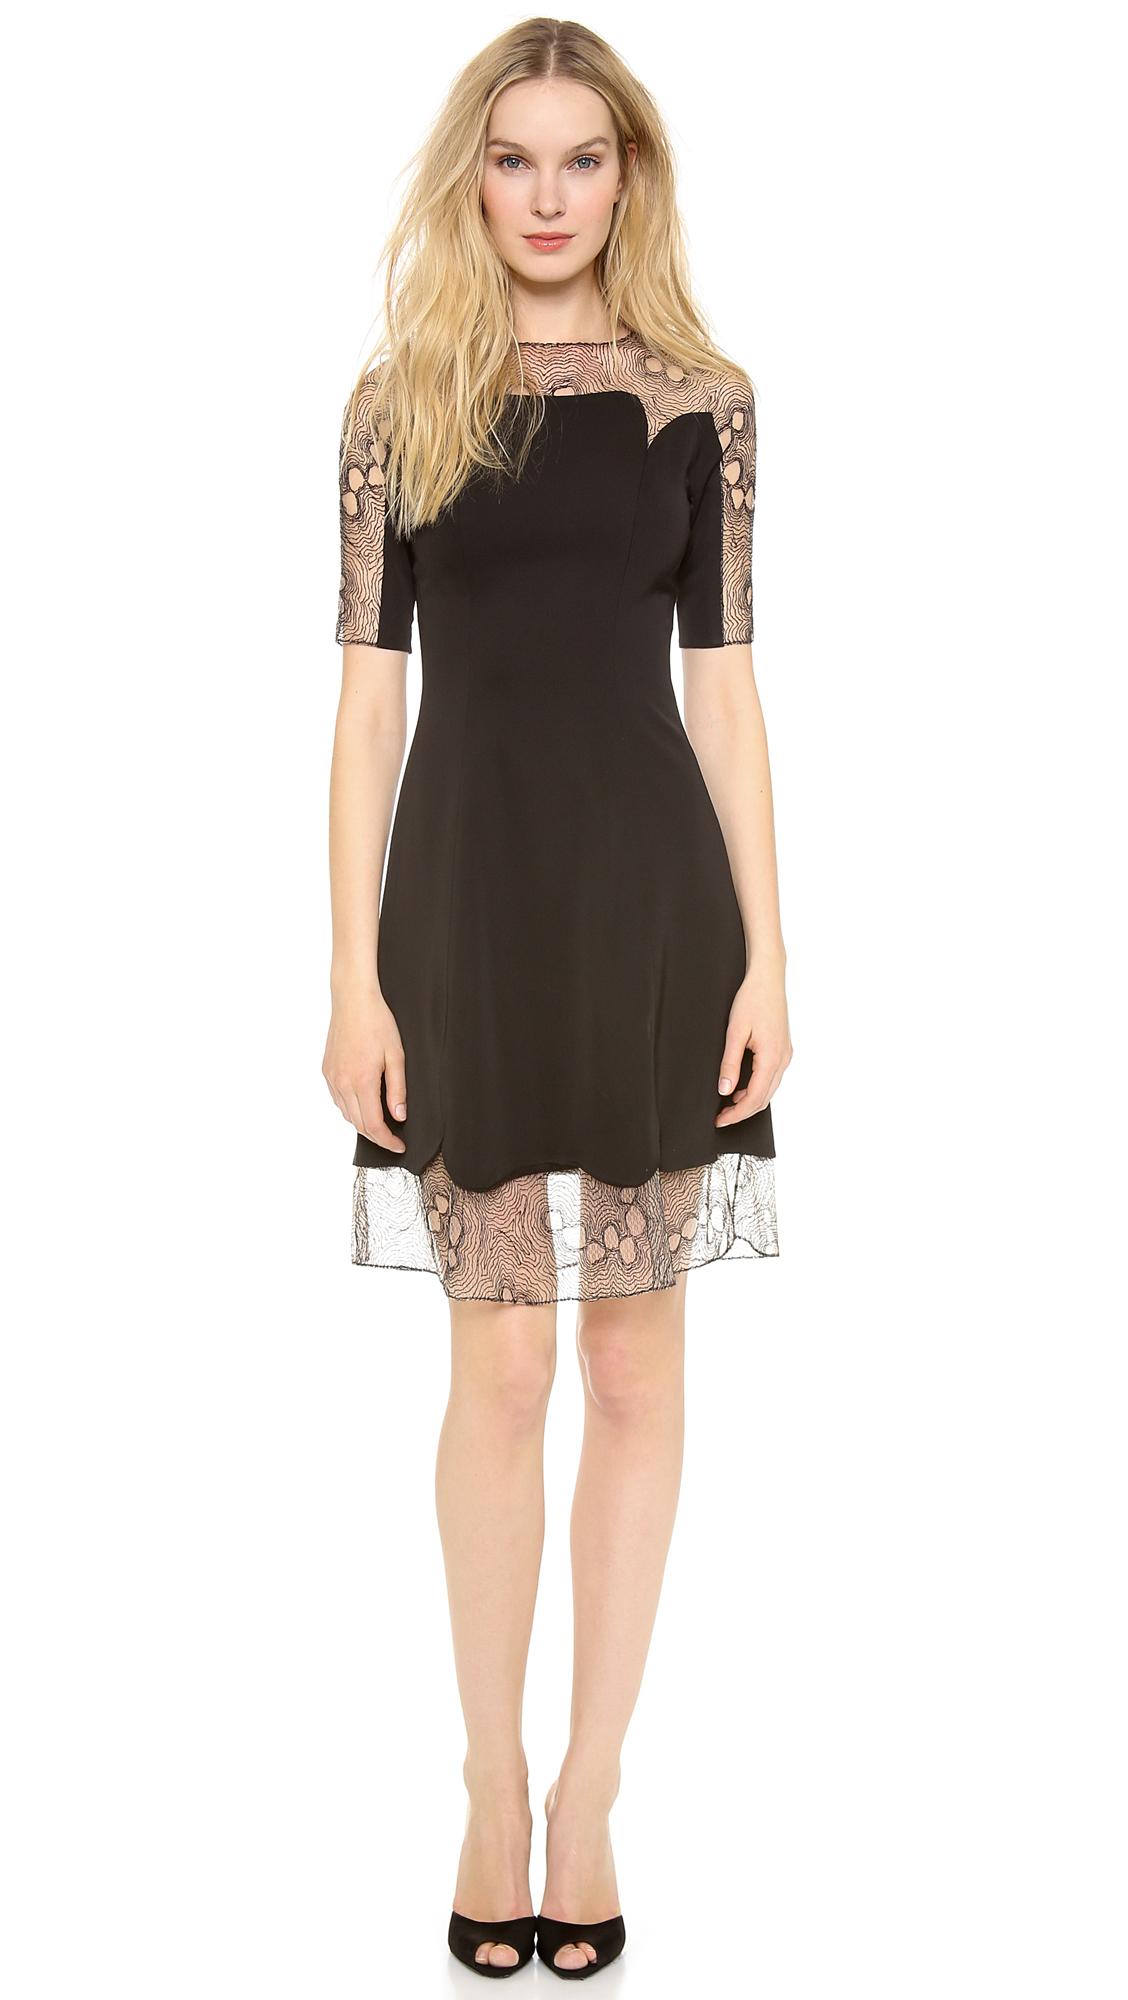 Black dress lace trim